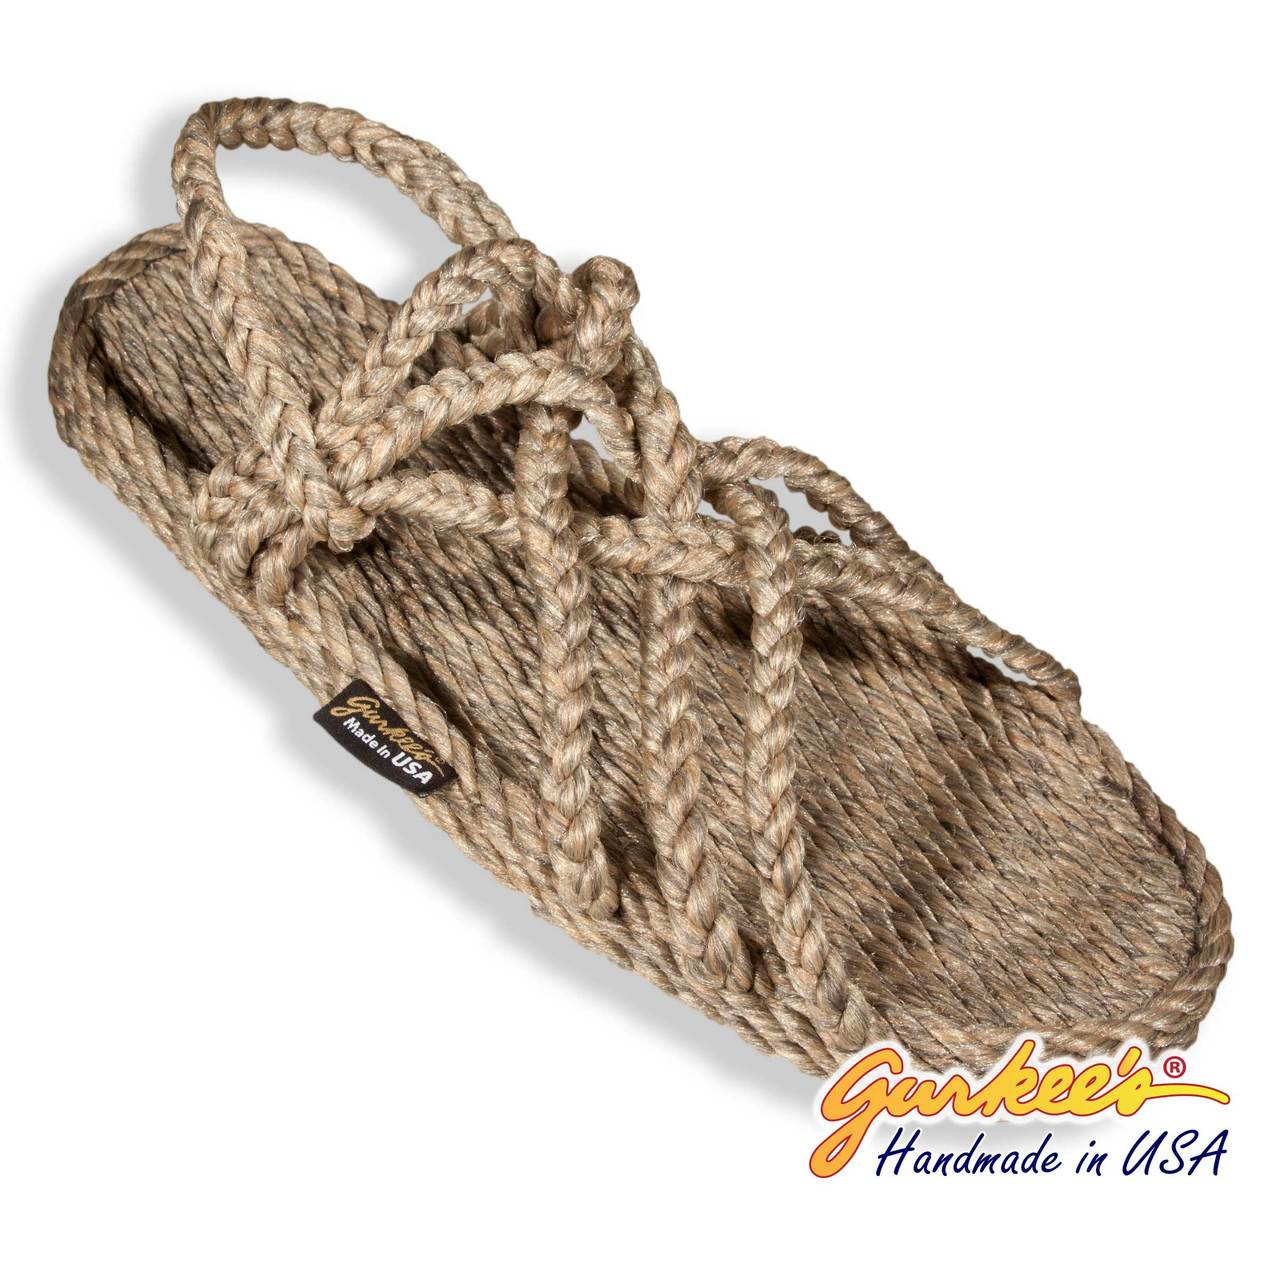 d190084b0580b7 Braided bunch neptune hemp color rope sandals gurkees jpg 1280x1280 Rope  sandals